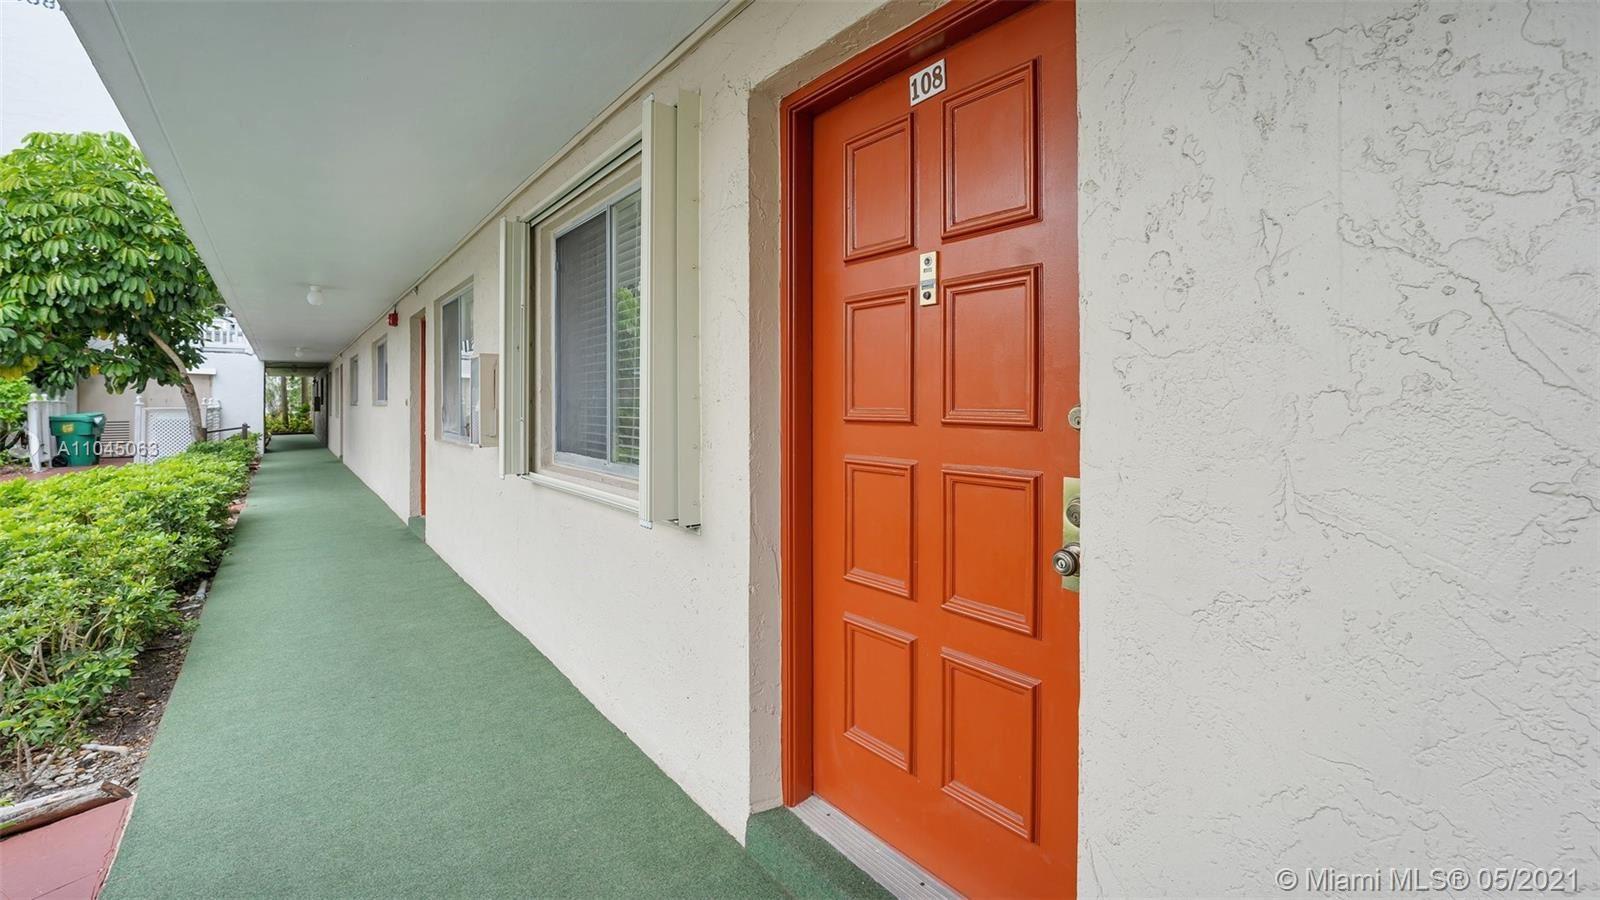 3581 Inverrary Dr #108, Lauderhill, FL 33319 - #: A11045063